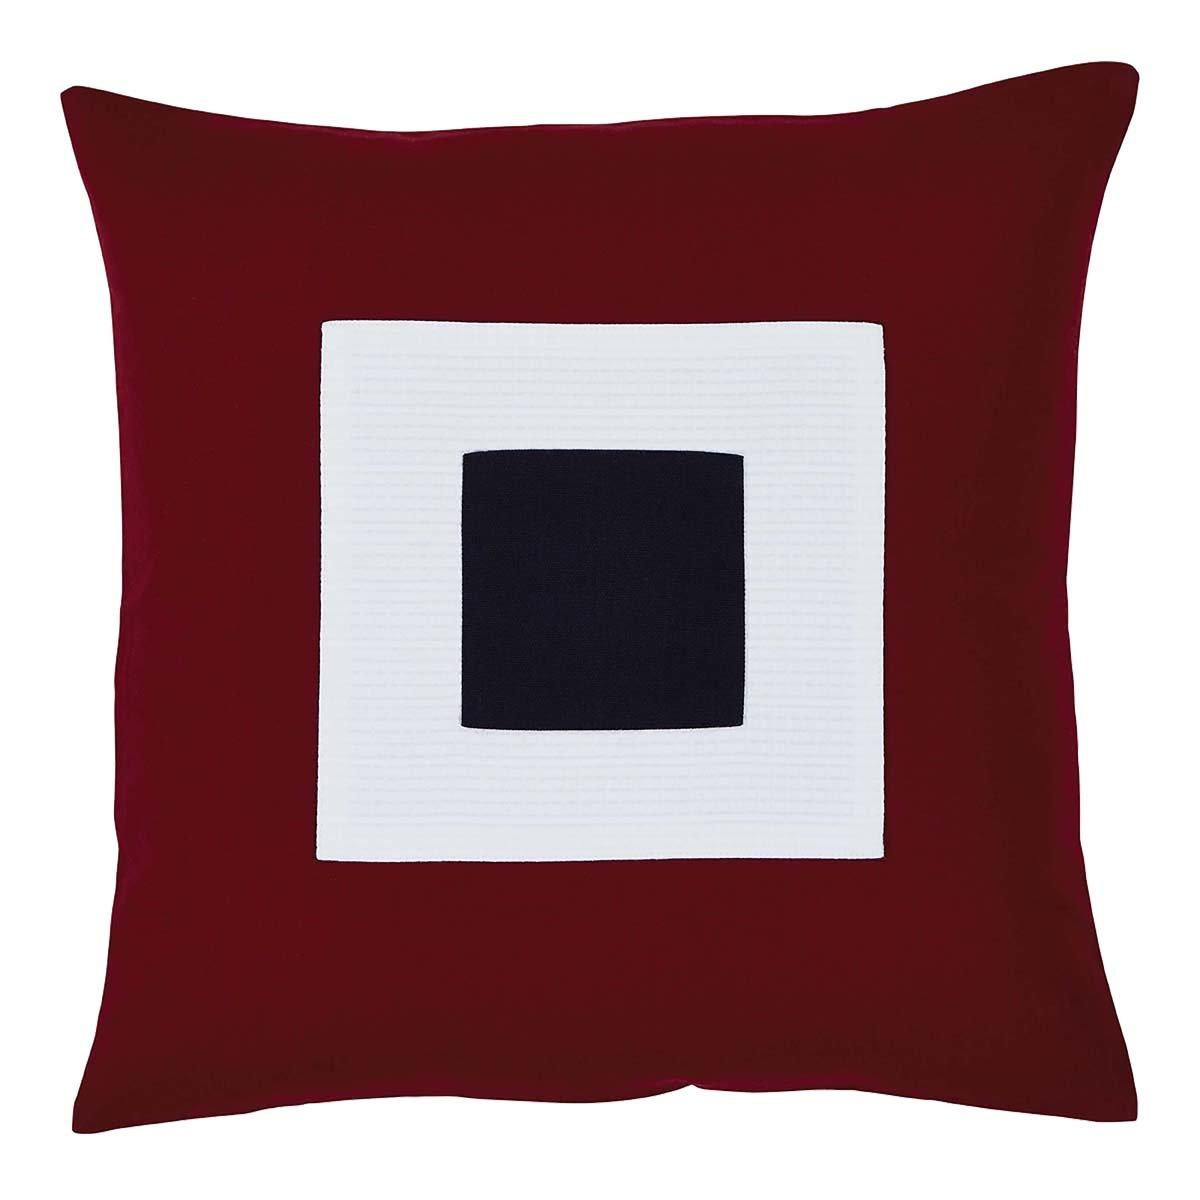 VHC Brands Americana Primitive Pillows & Throws - Patriotic Block Applique White 18' x 18' Pillow